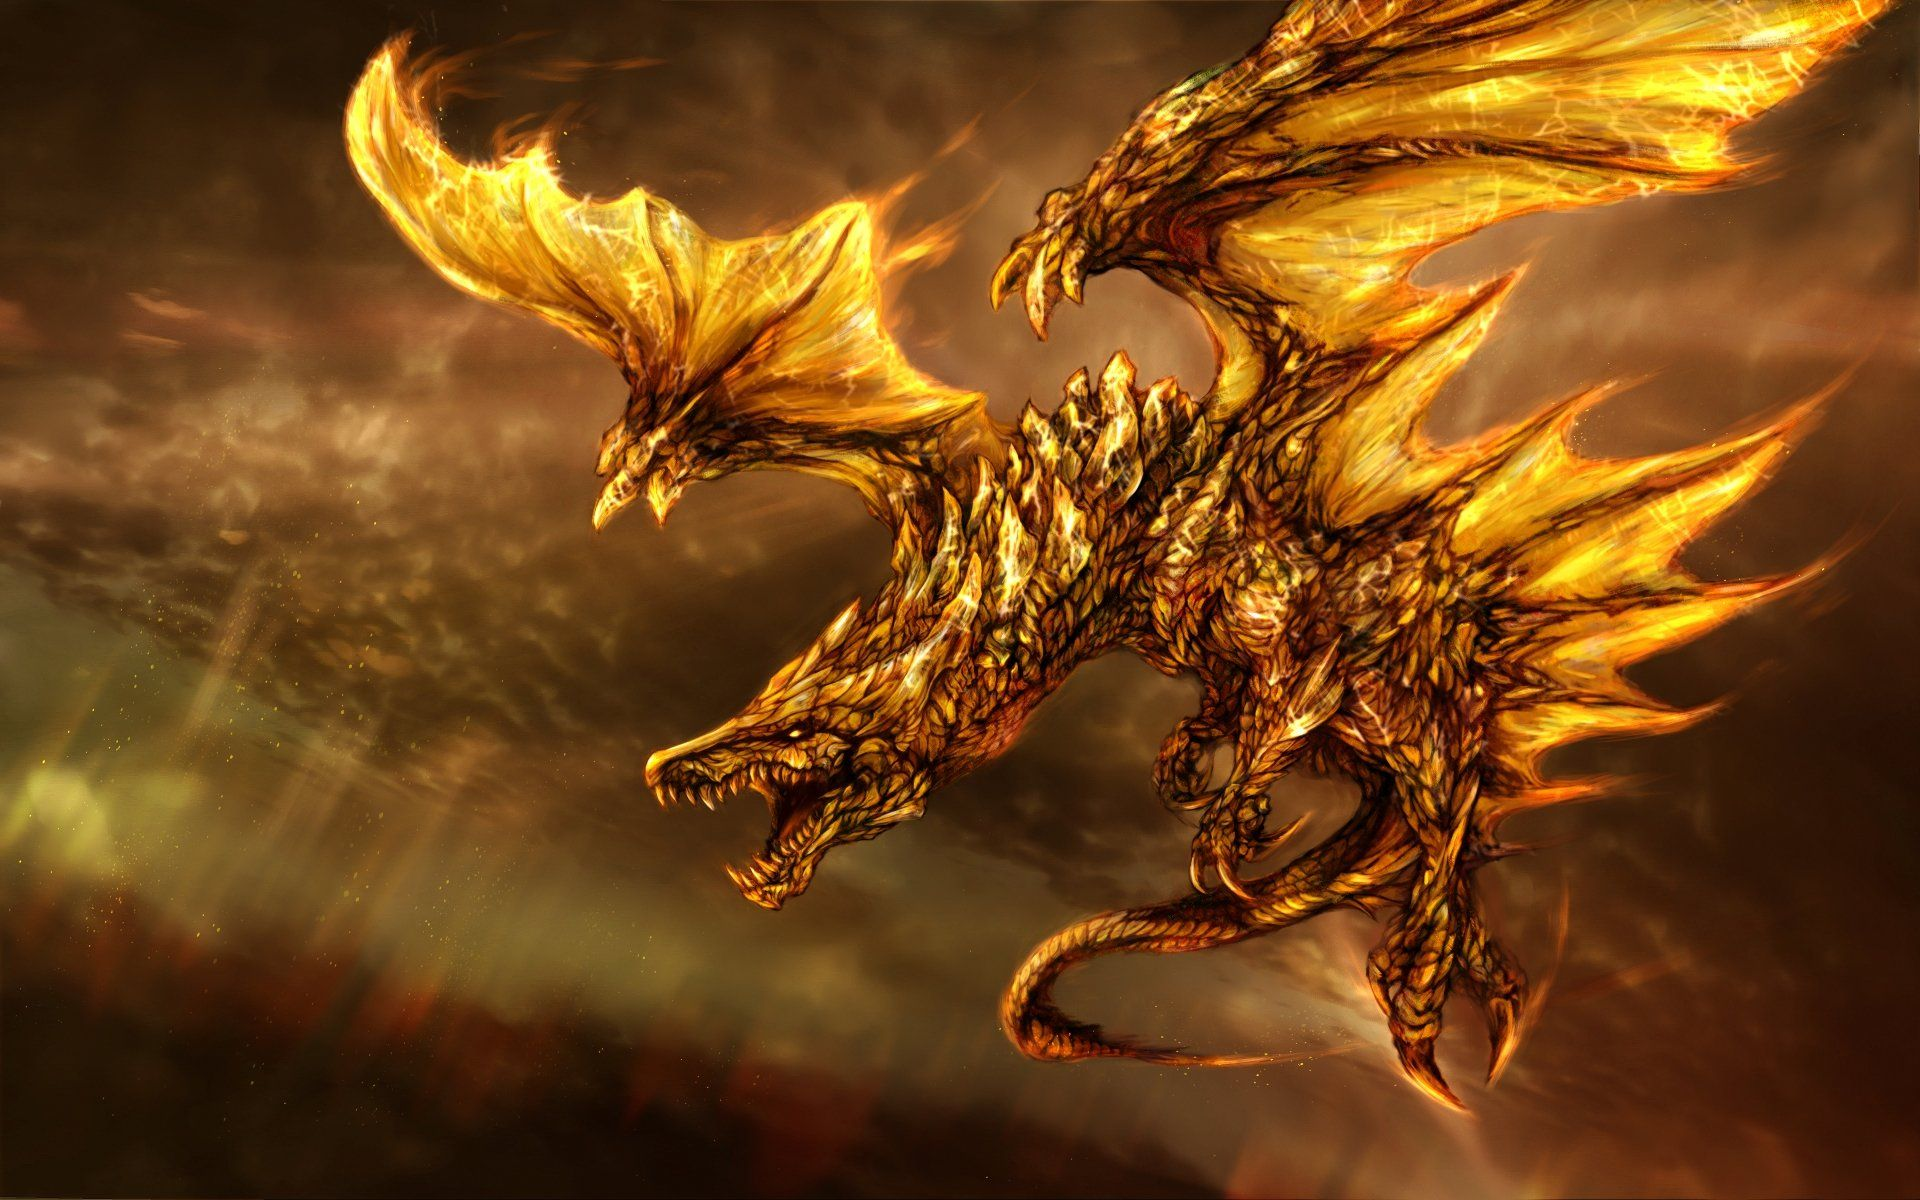 Dragon Fire Wallpapers HD 5150 Wallpaper Cool Walldiskpapercom 1920x1200